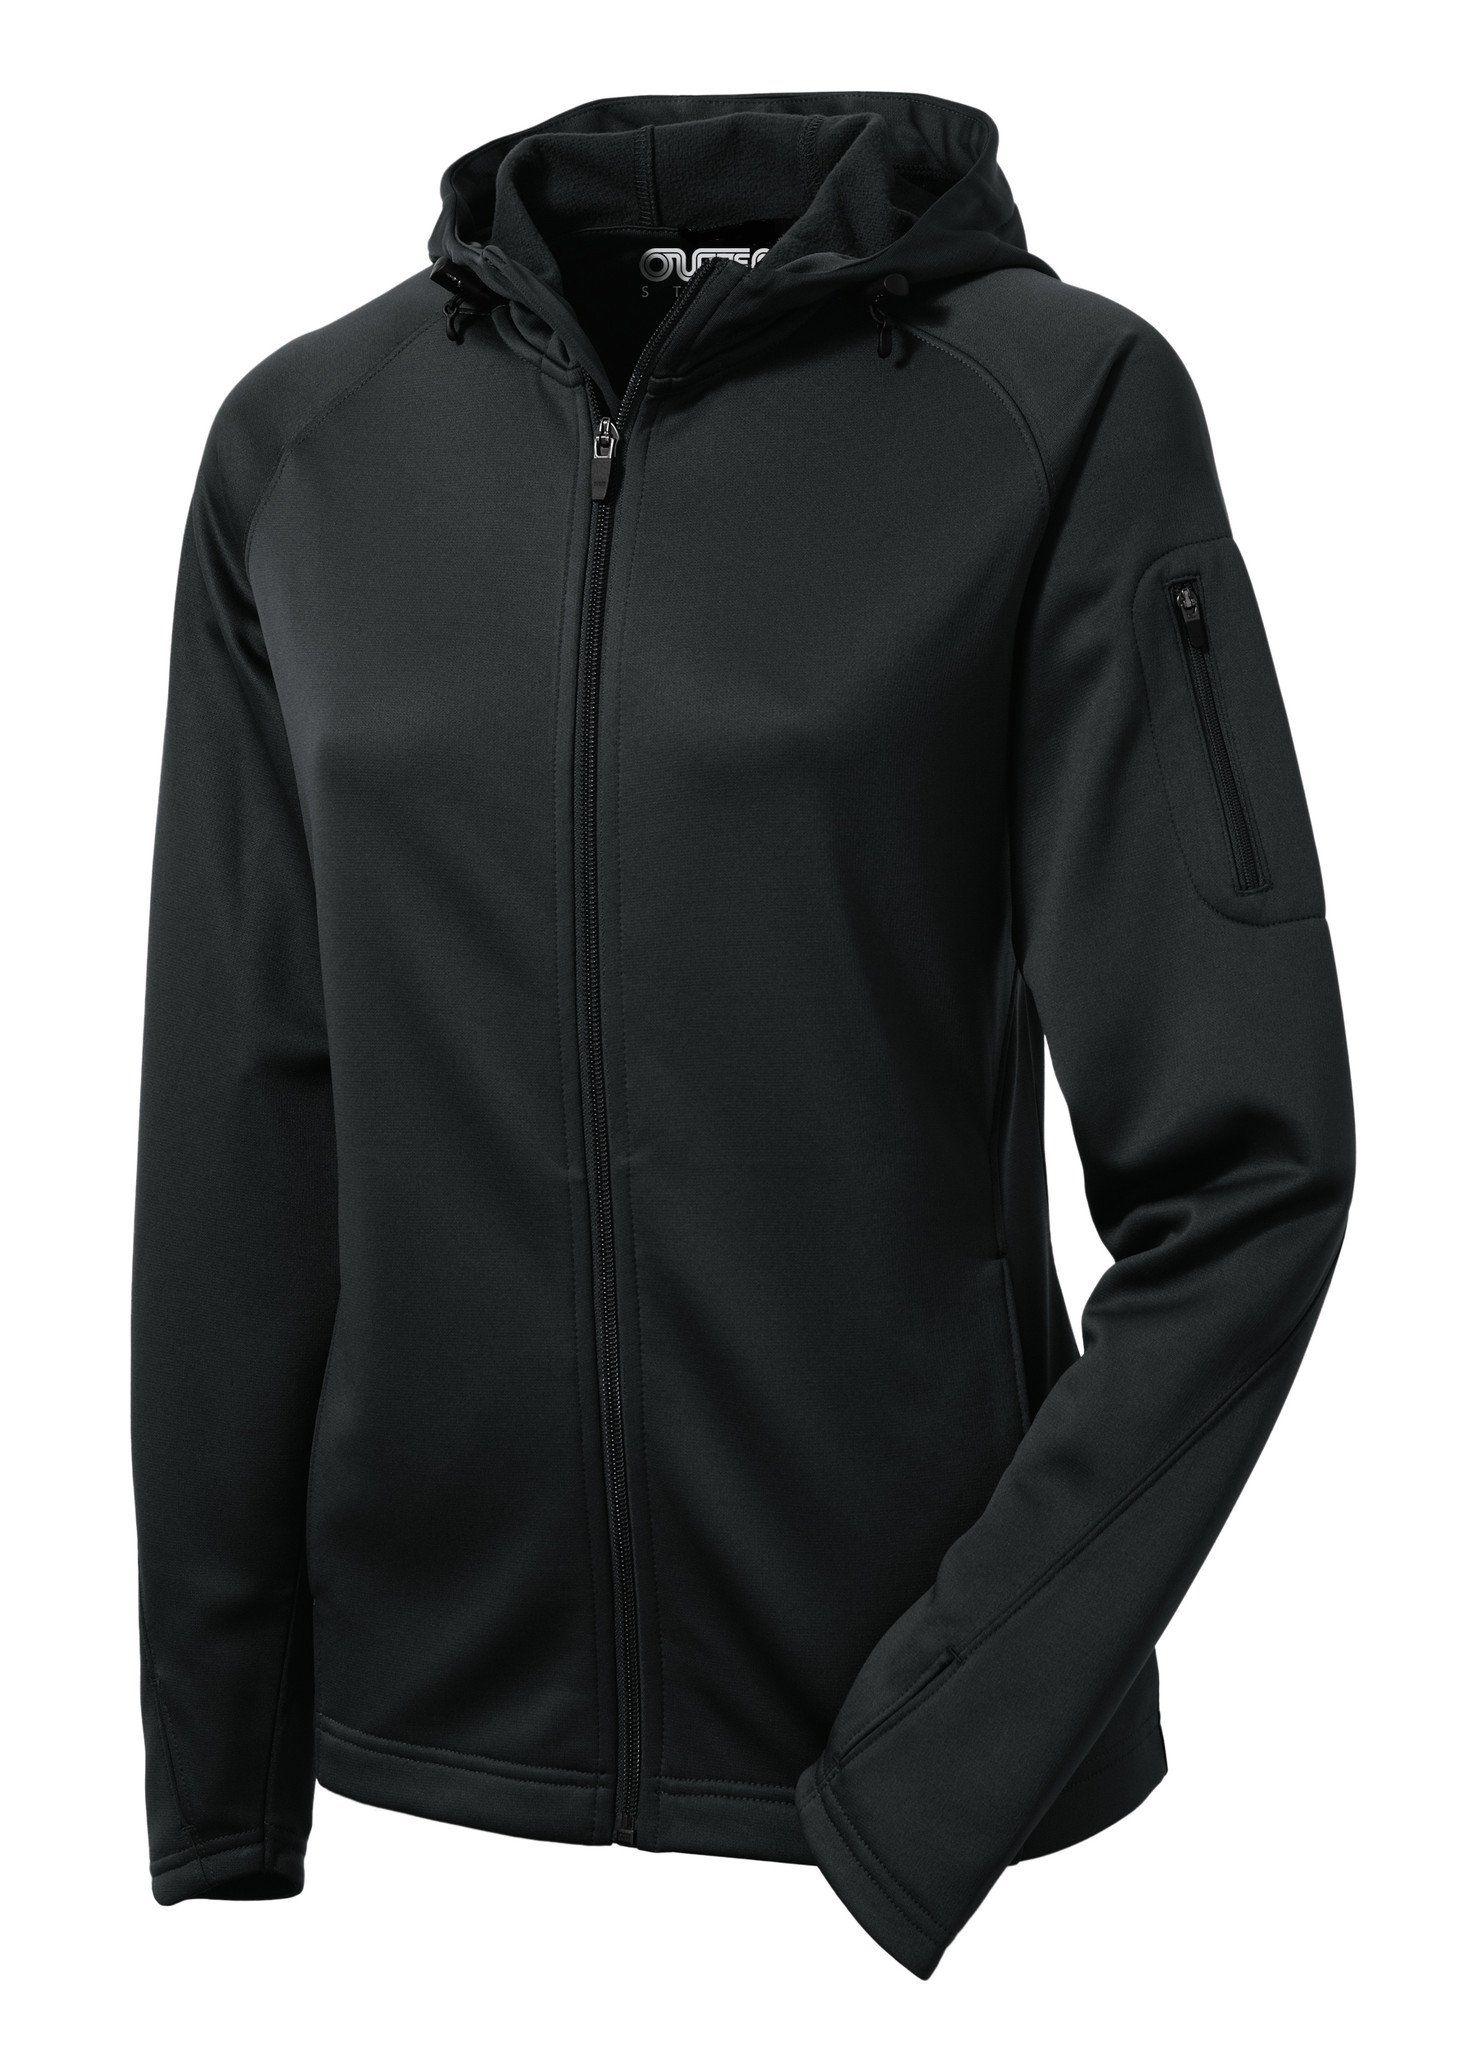 Women's Crosswalk Jacket (SEEN ON TODAY SHOW) Hooded